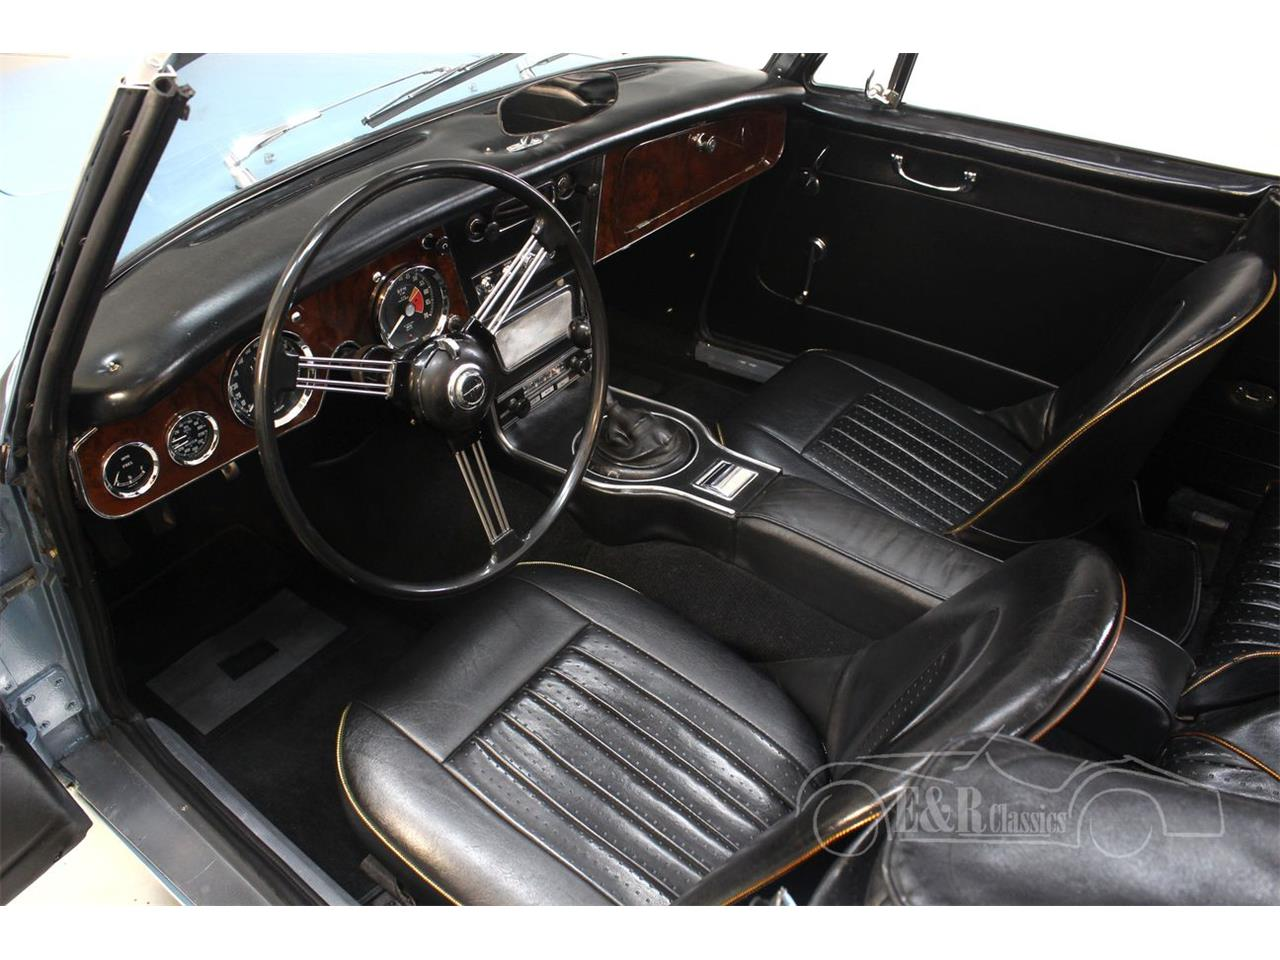 1966 Austin-Healey 3000 Mark II (CC-1362675) for sale in Waalwijk, Noord-Brabant